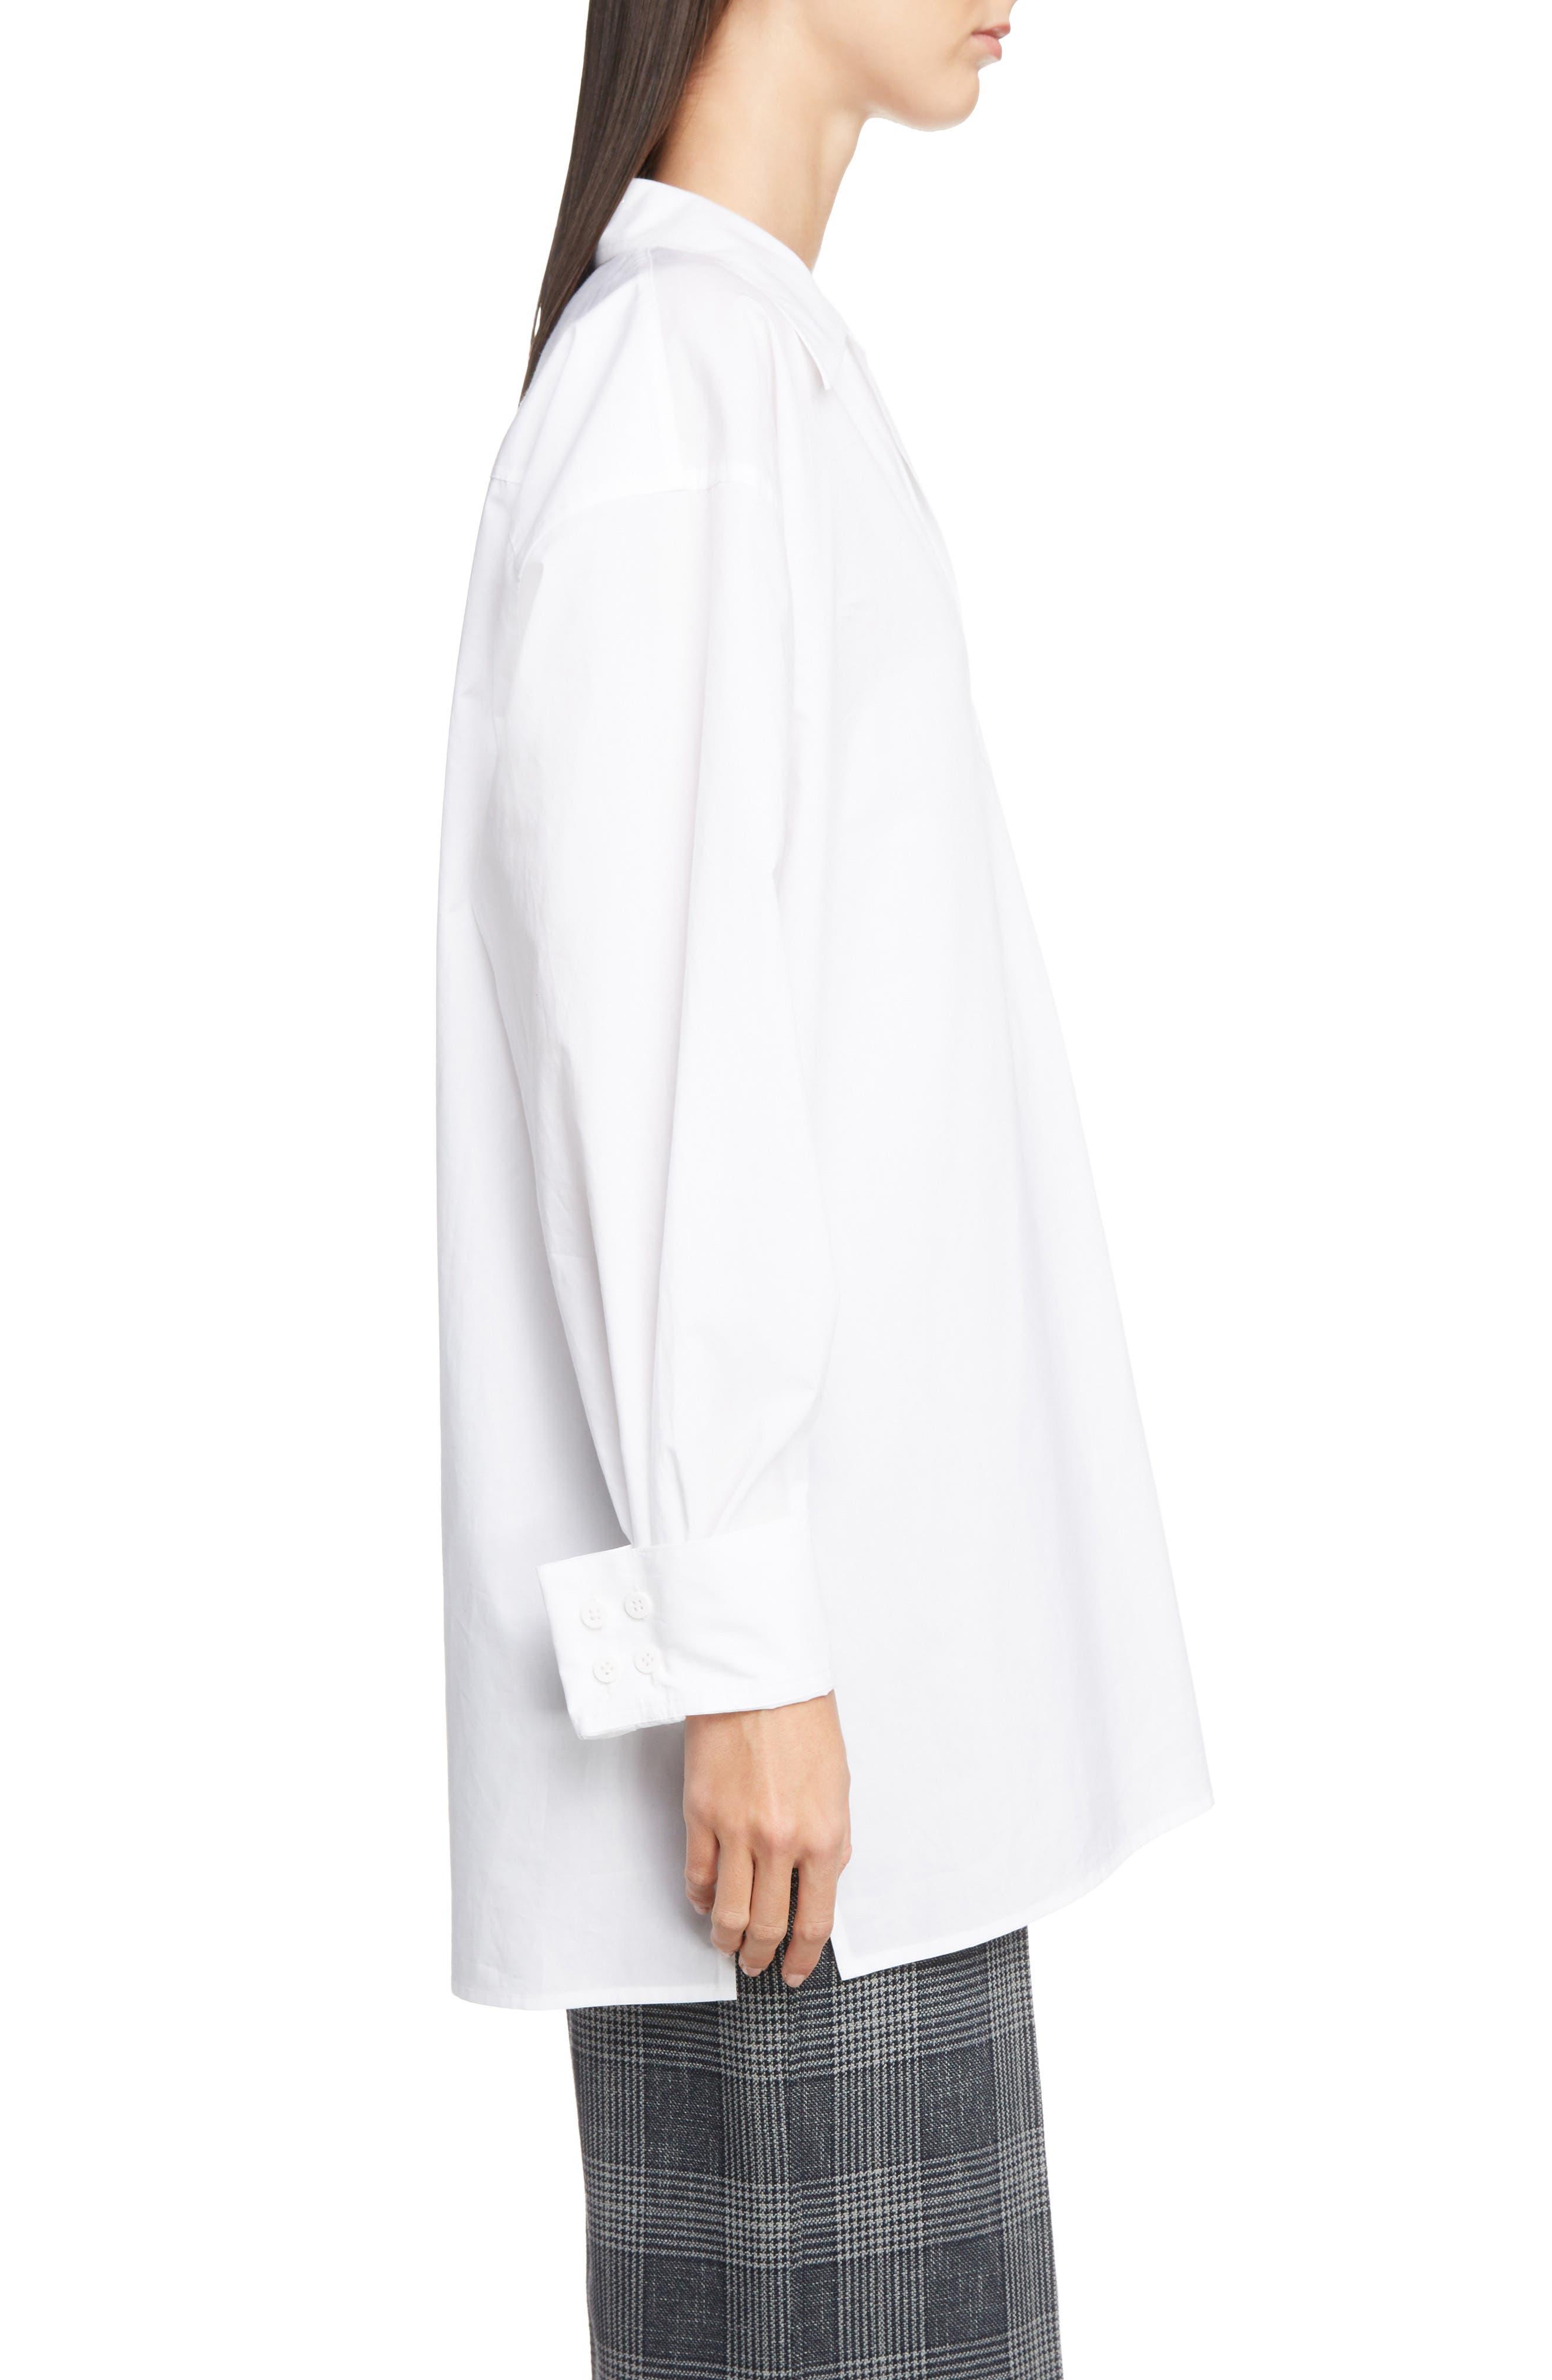 ACNE STUDIOS,                             Spread Collar Shirt,                             Alternate thumbnail 3, color,                             WHITE